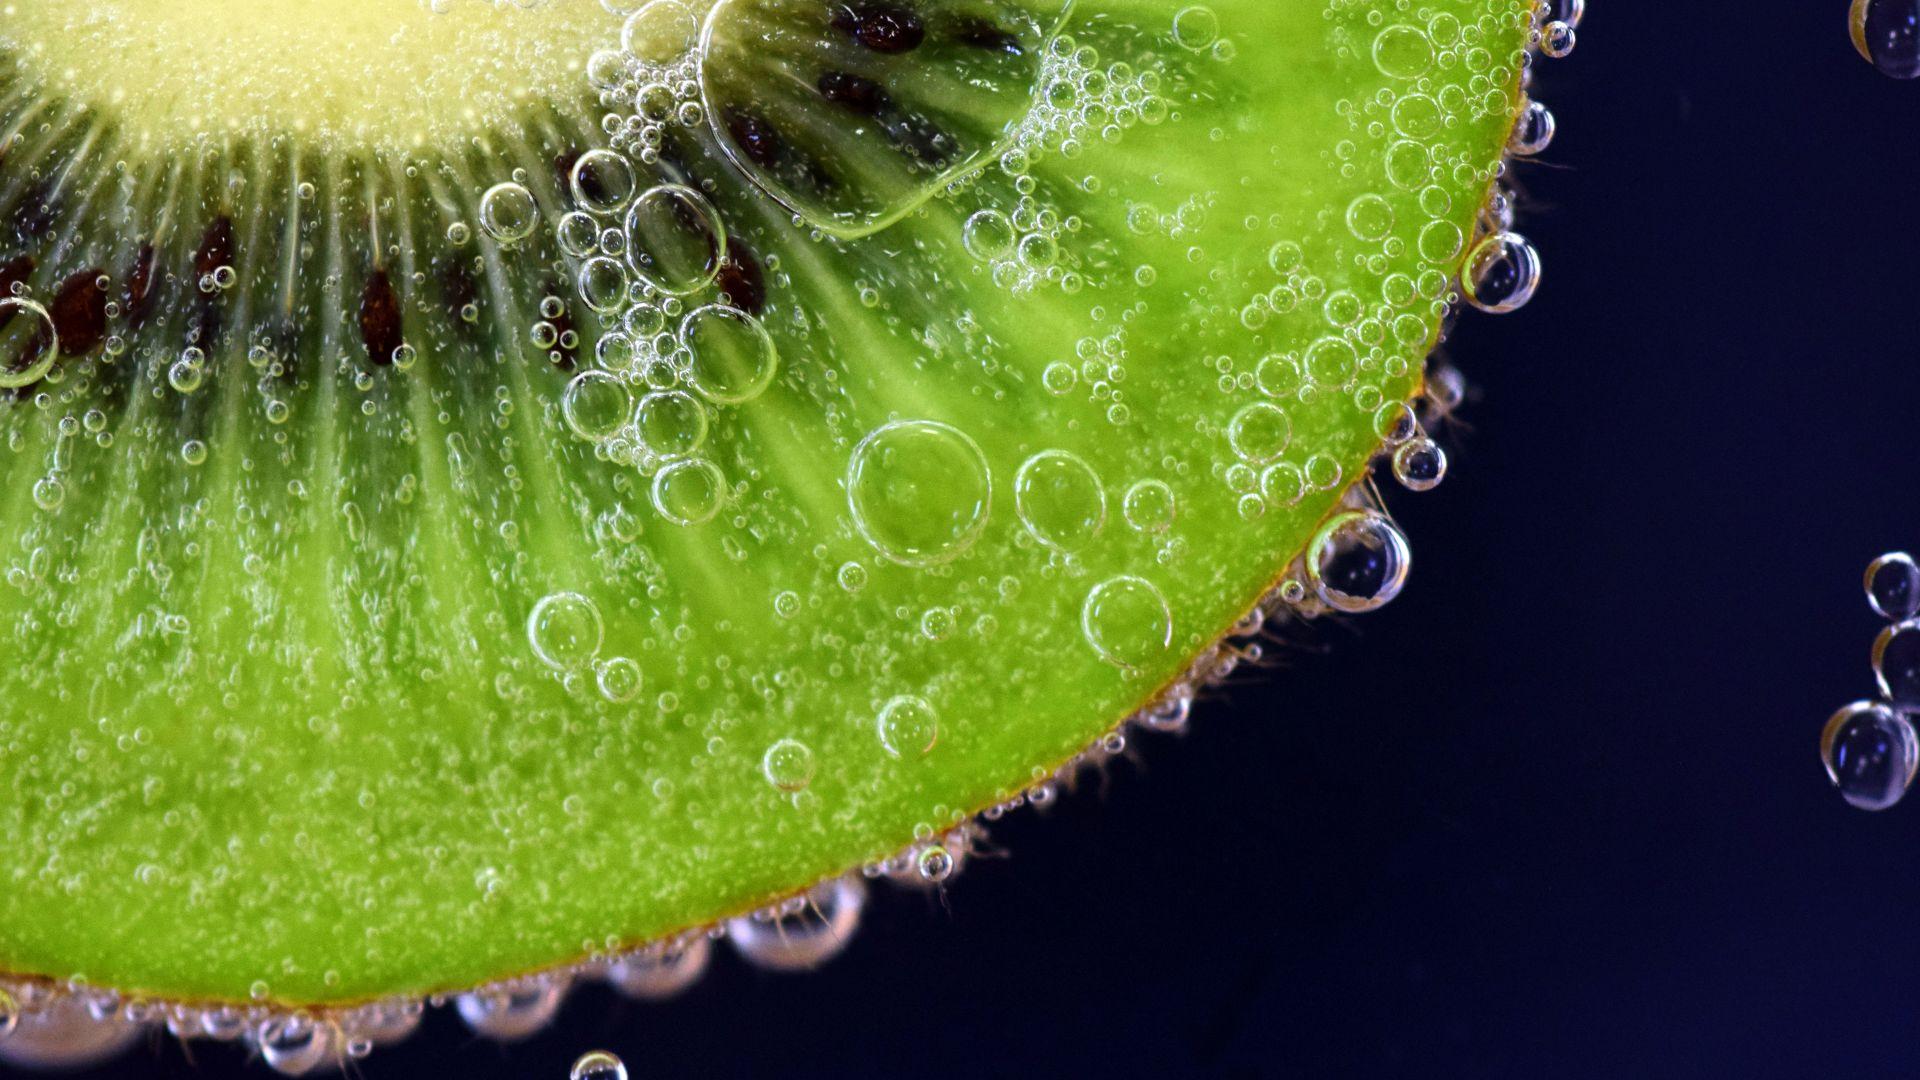 Wallpaper Kiwifruit, fruits, submerged, bubbles